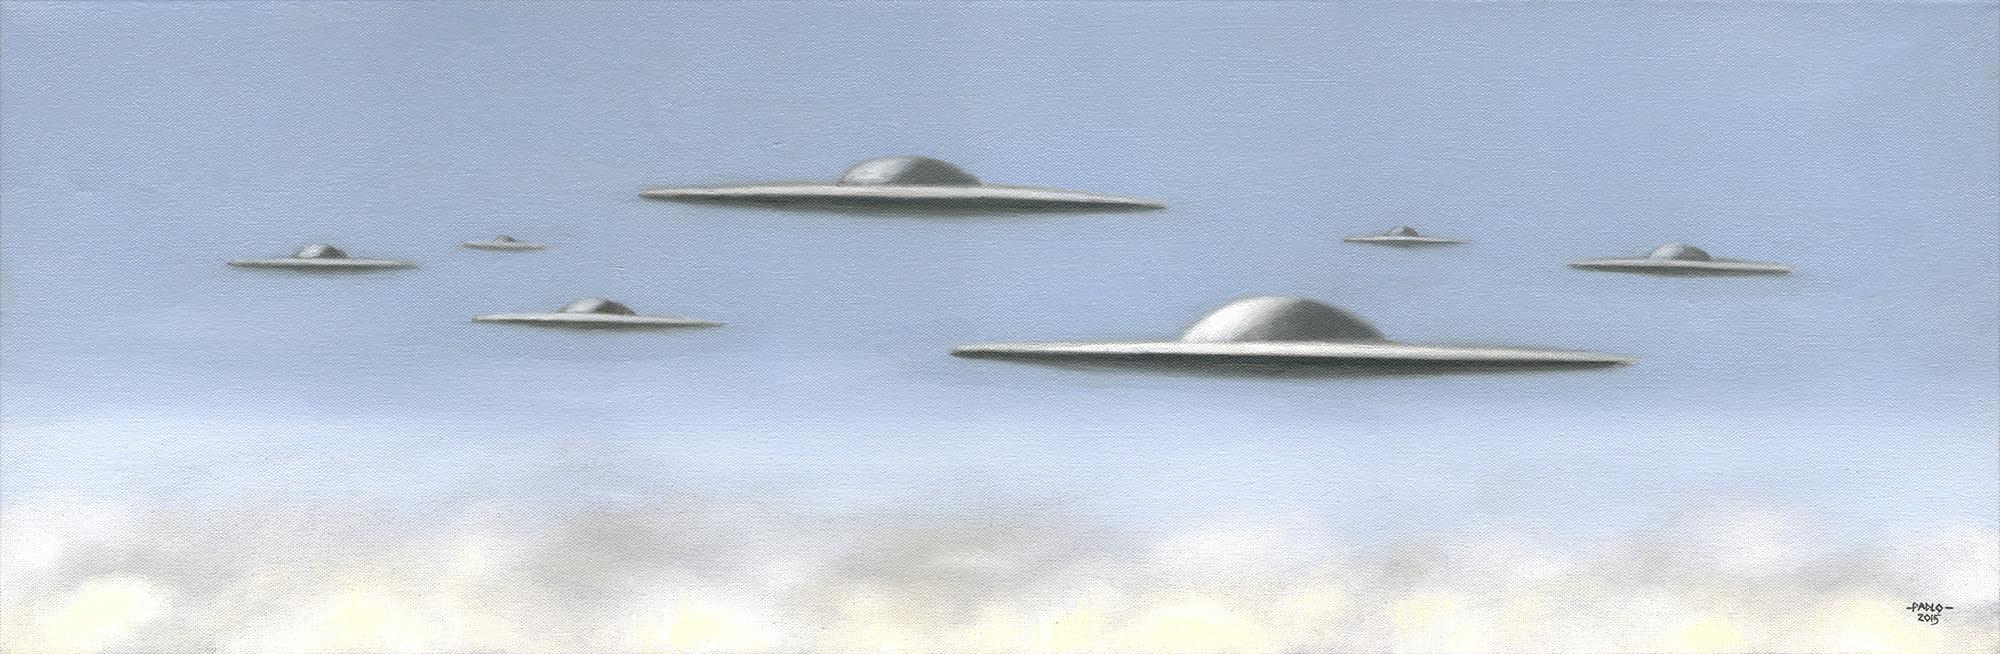 UFO SIGHTING 26